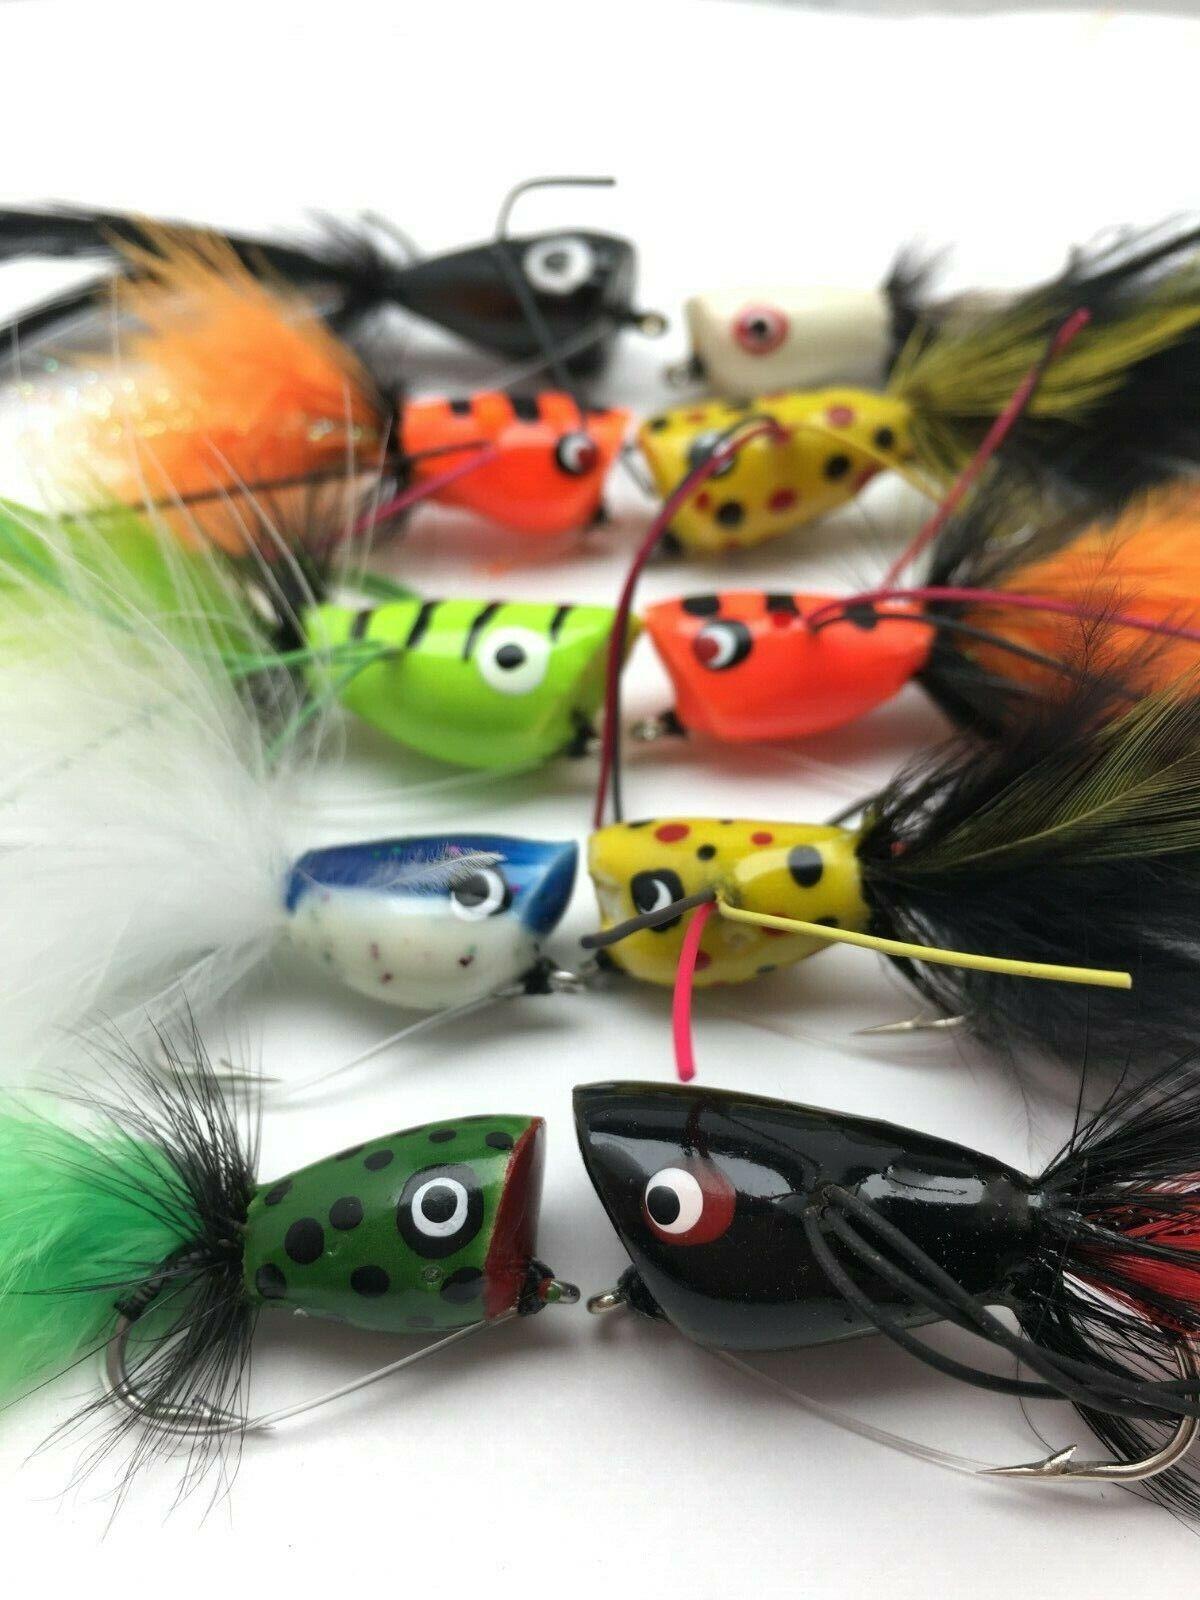 Fishing Bass Pike Flies POPPERS Size 4 Saltwater Bass Trout Perch Chub #320